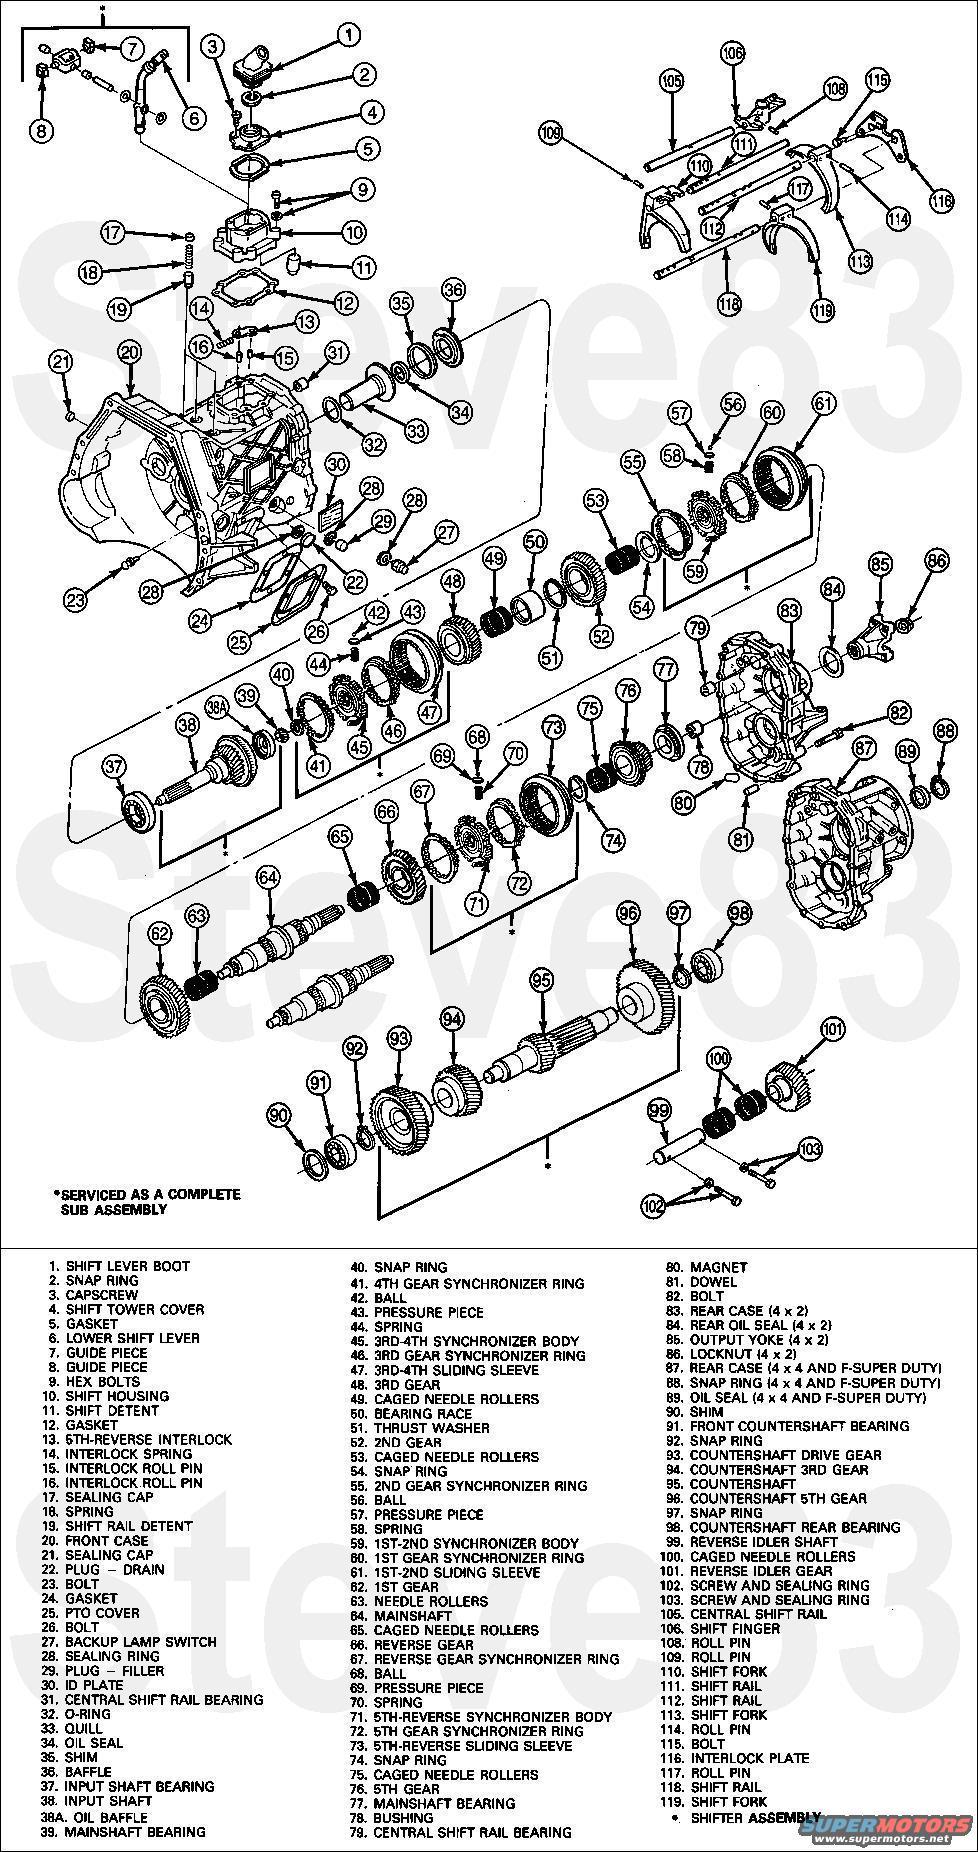 Fuller Transmission Diagram. Diagrams. Wiring Diagram Gallery